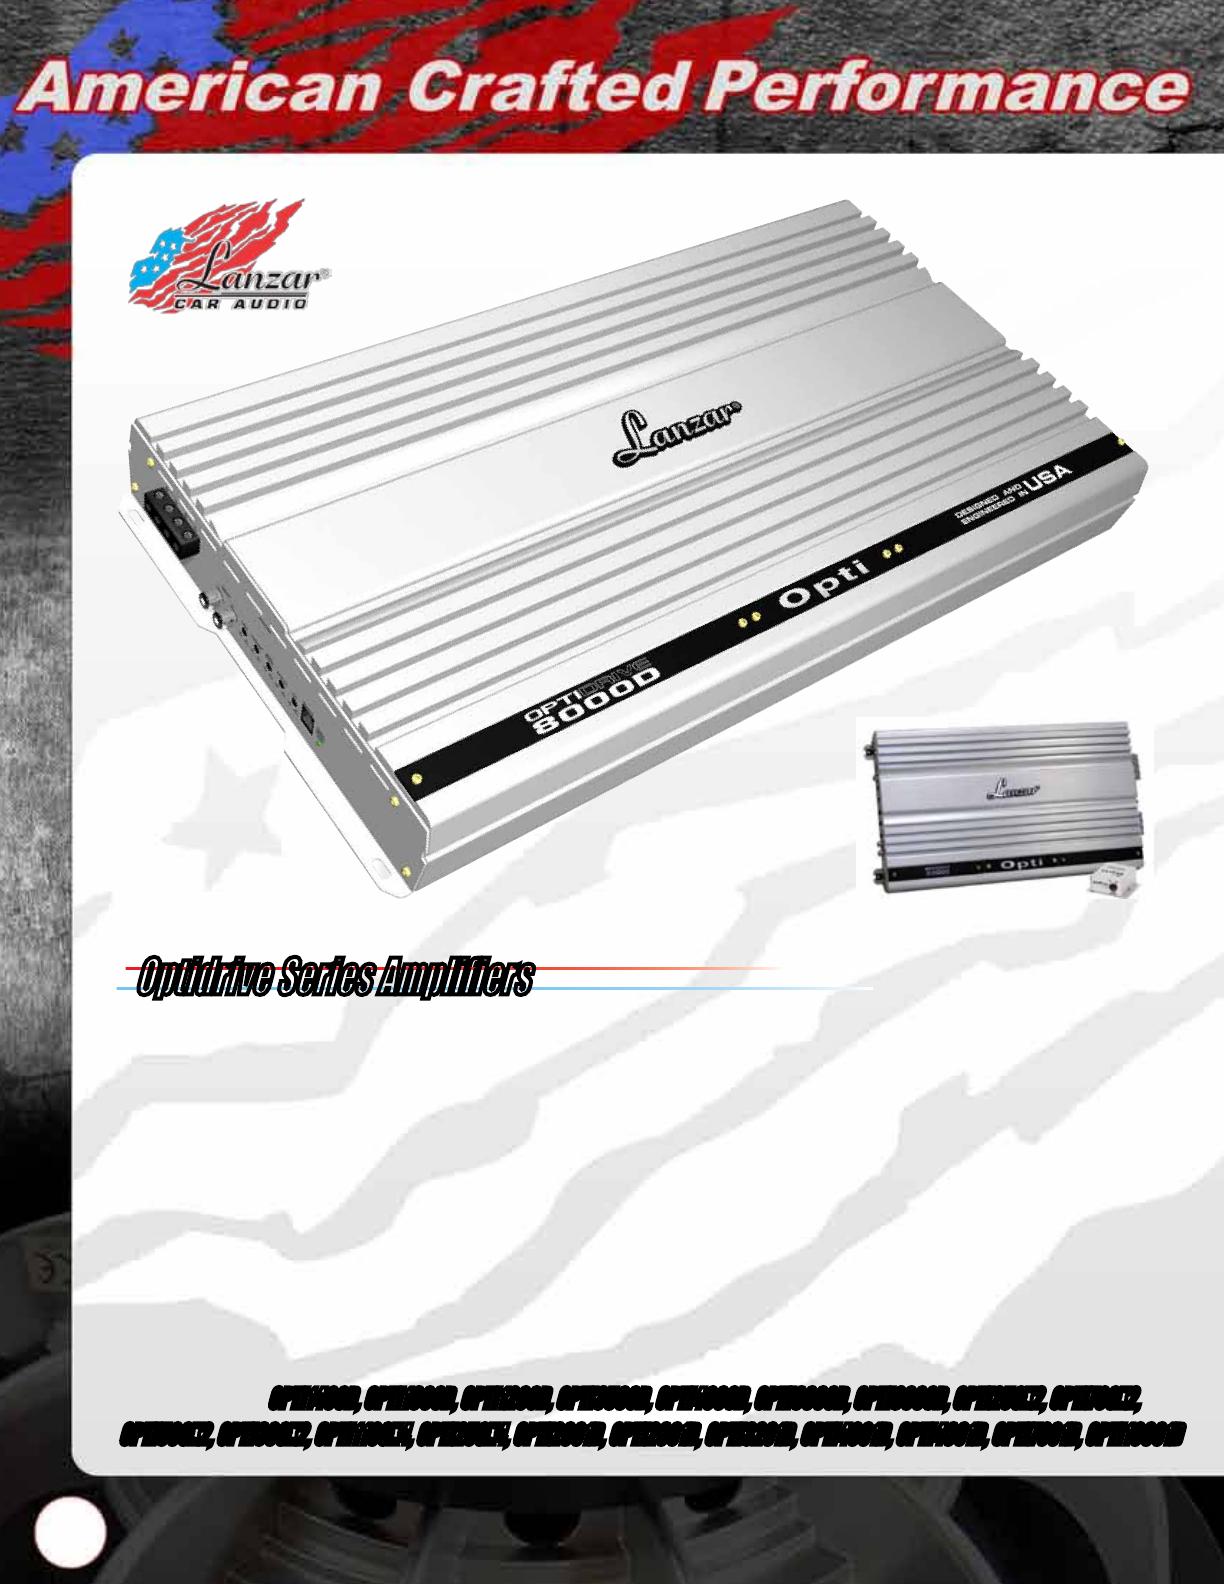 Lanzar Speakers Installation Instructions Max Mxa224 Catalog Ampkit4 4 Gauge Contaq Amplifier Wiring Kit Parts Opti8000d